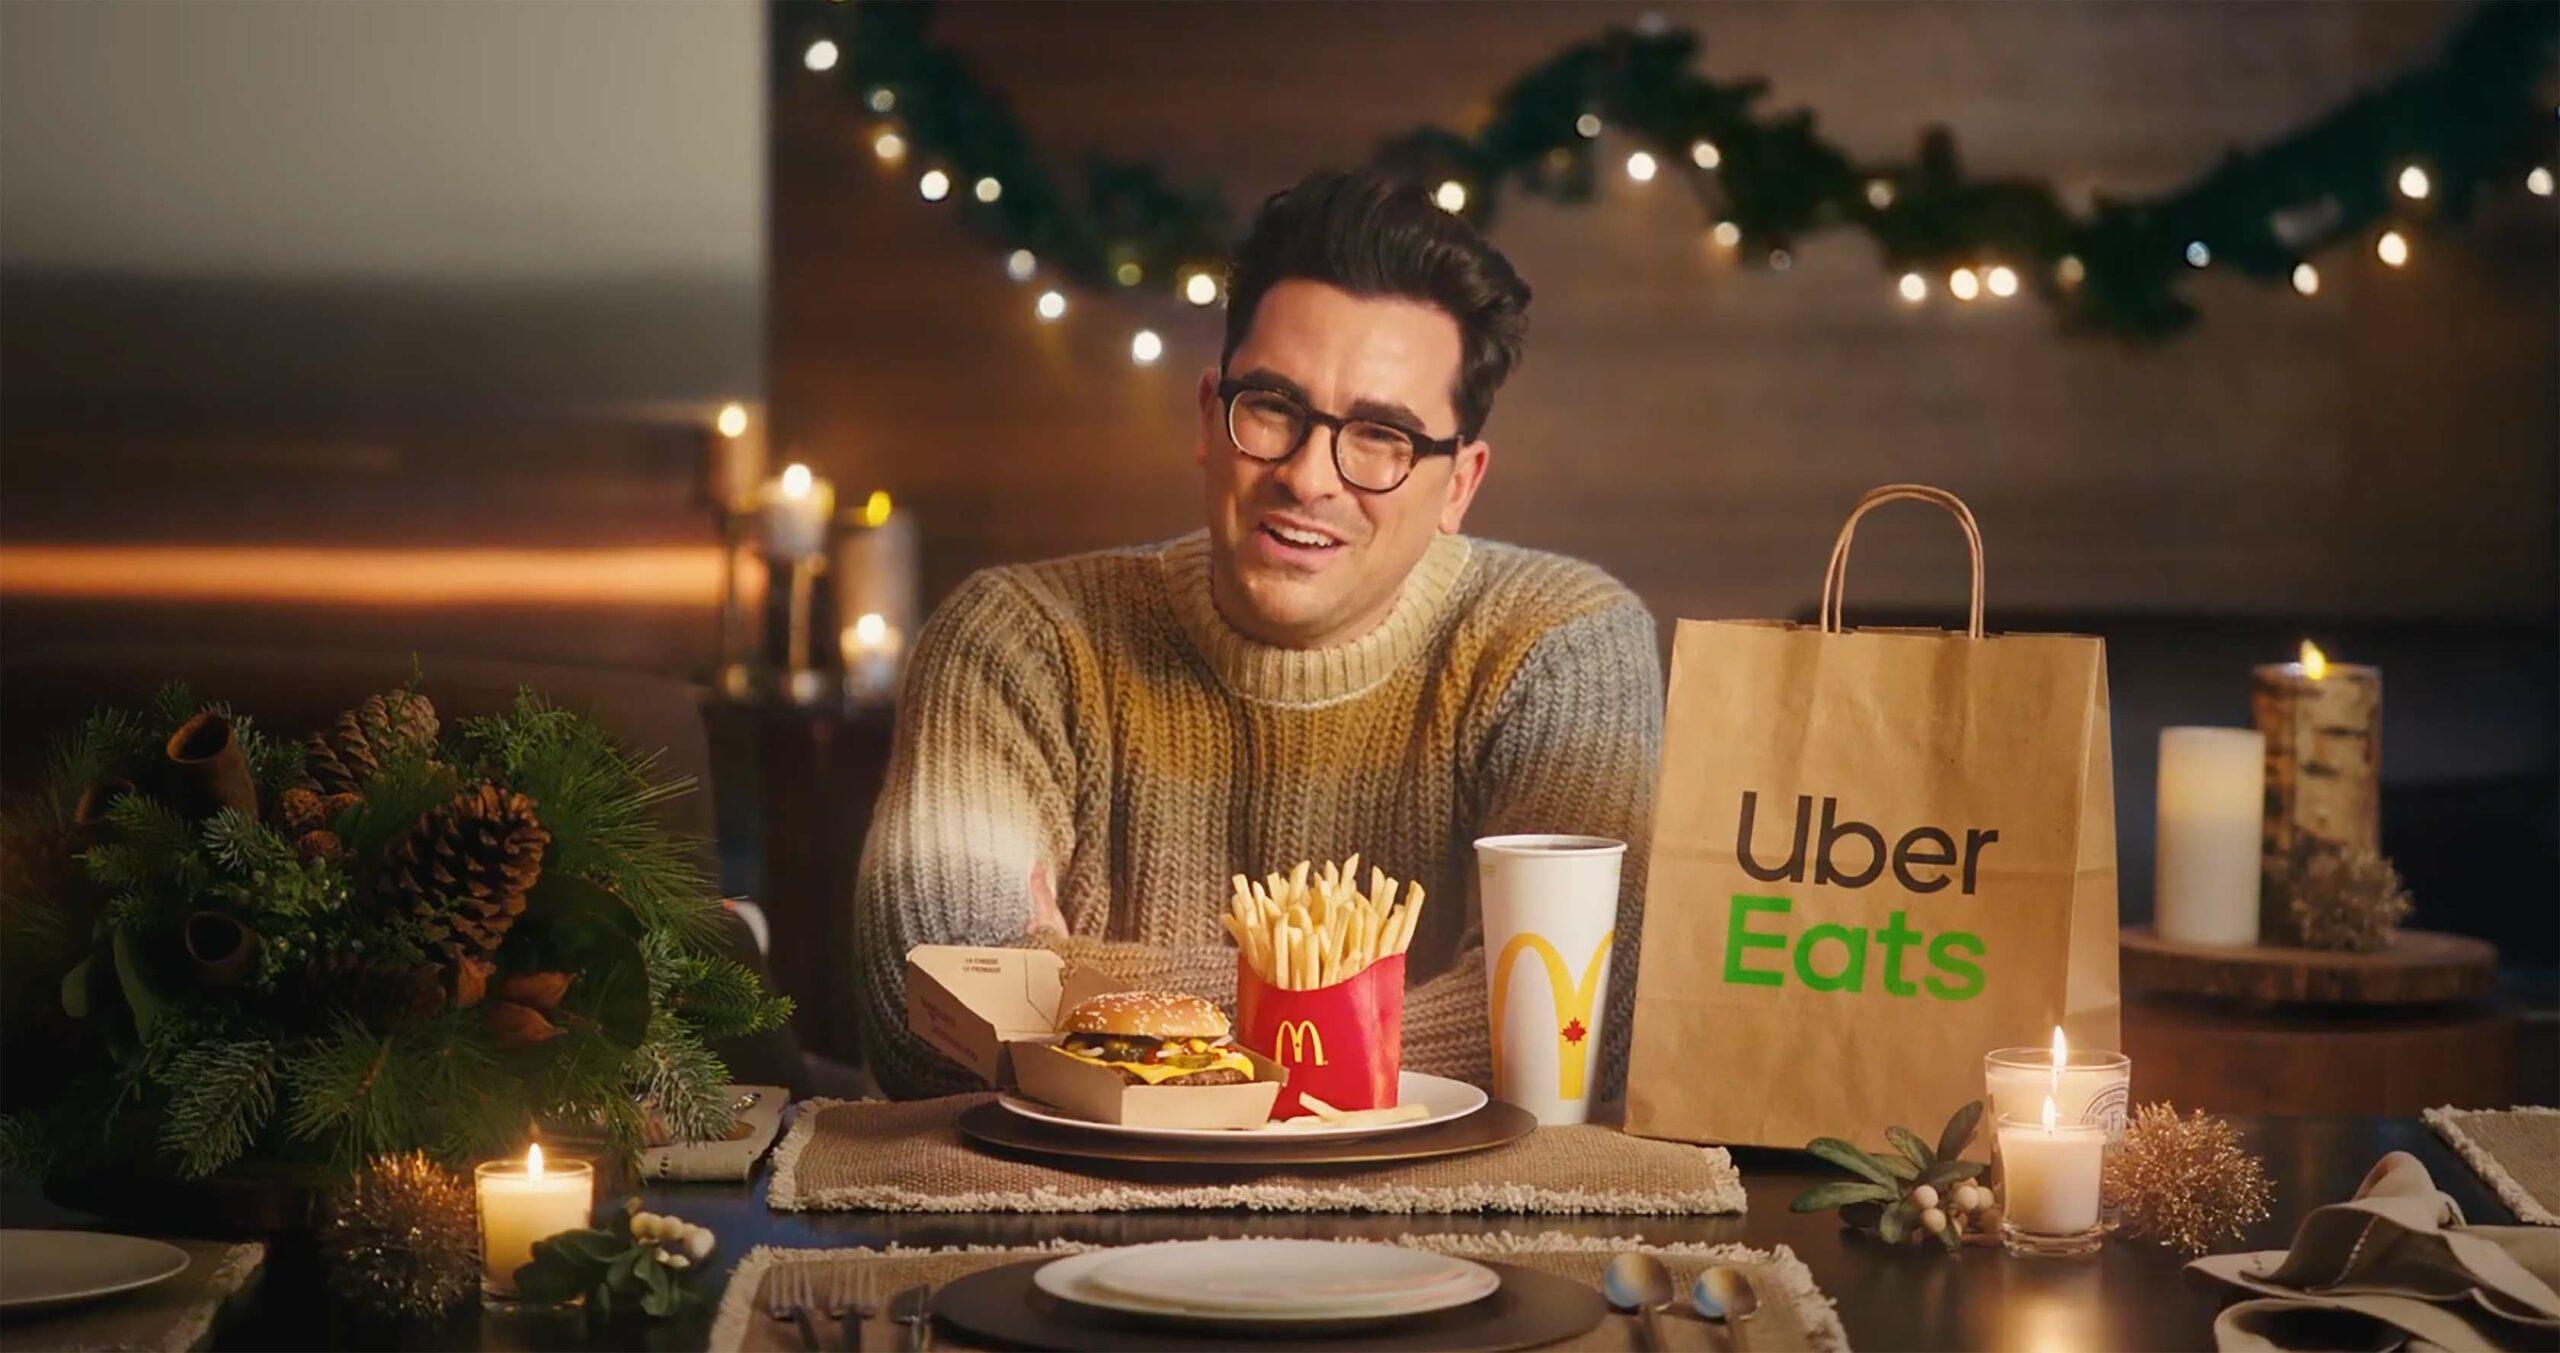 Dan Levy Uber Eats McDonalds